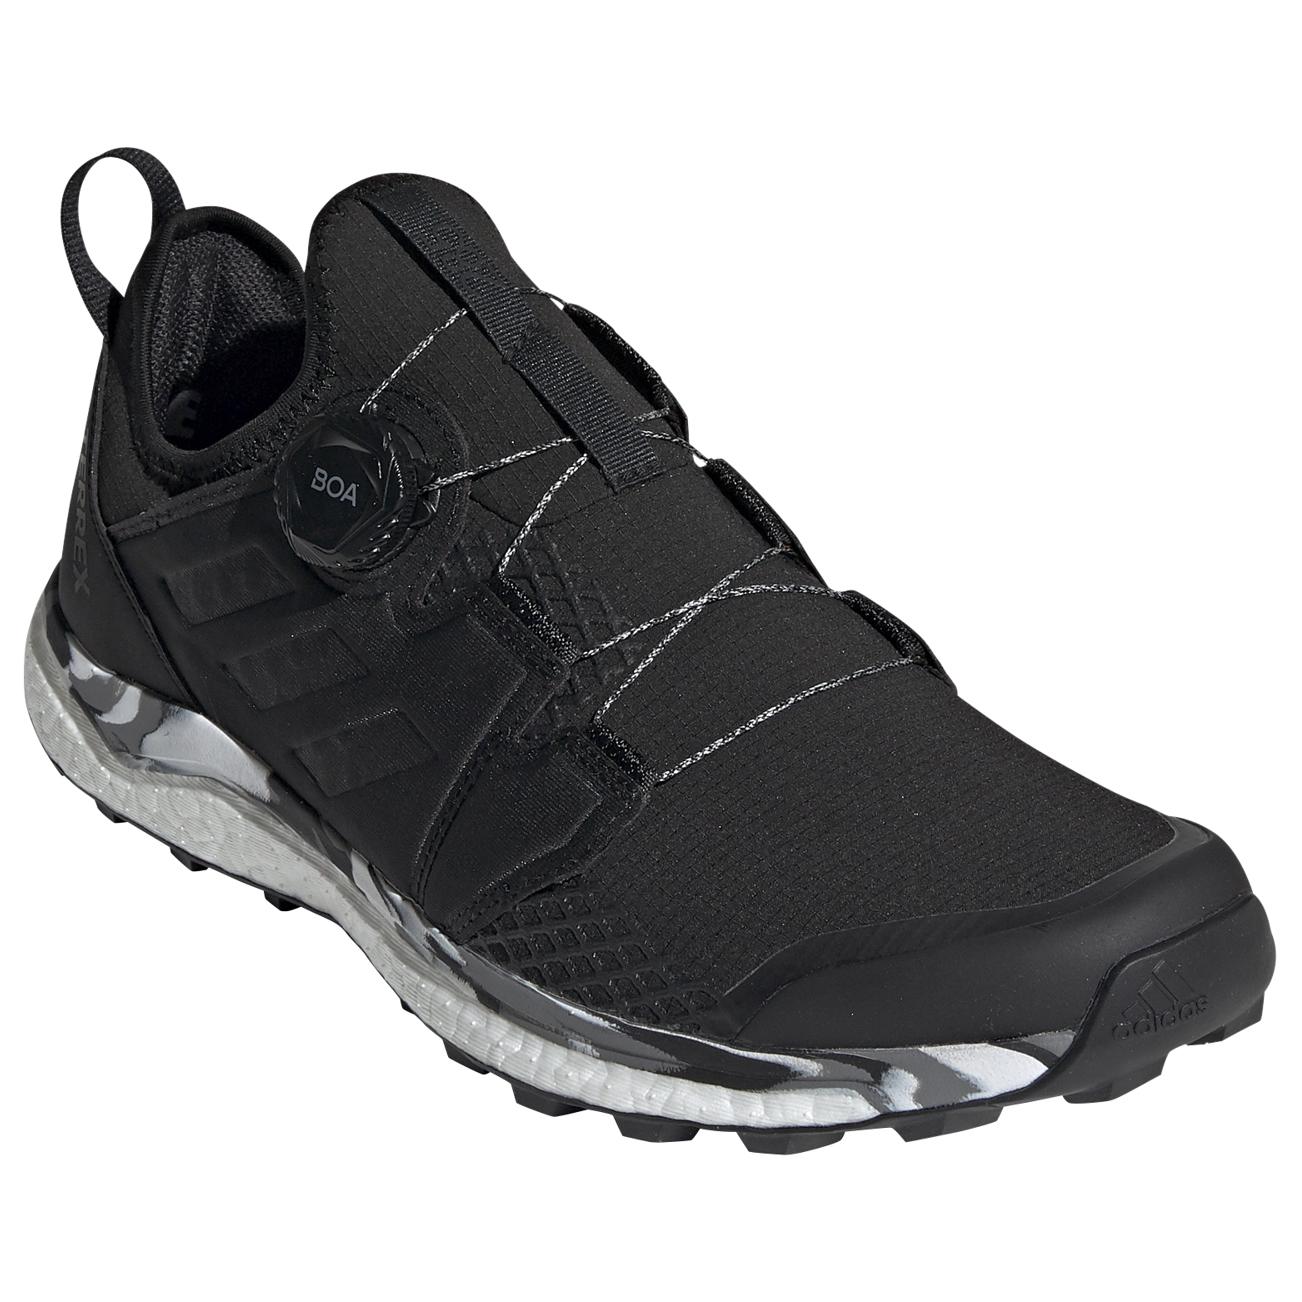 Adidas Terrex Agravic Boa - Trail